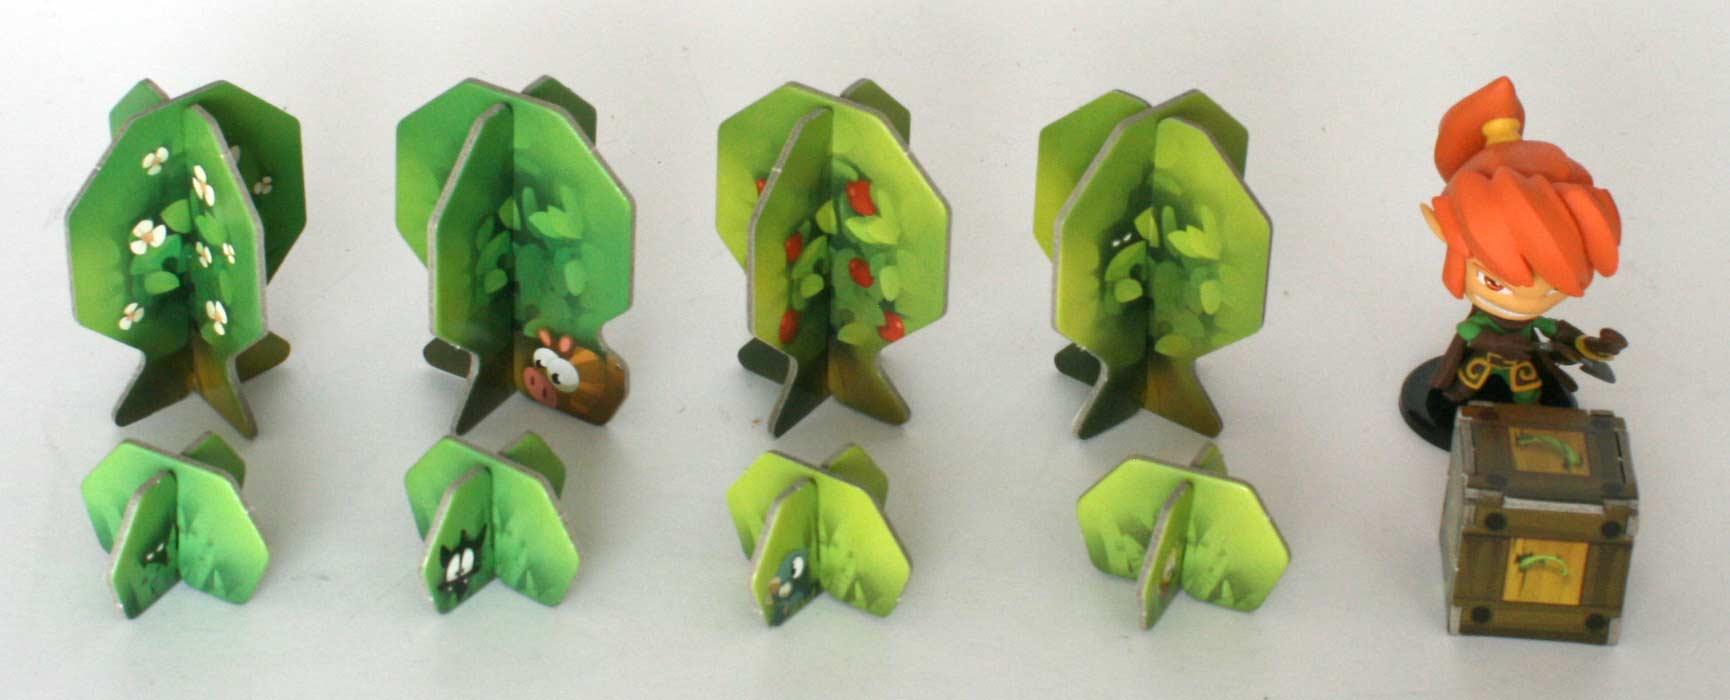 Krosmaster_03_arbres_buissons